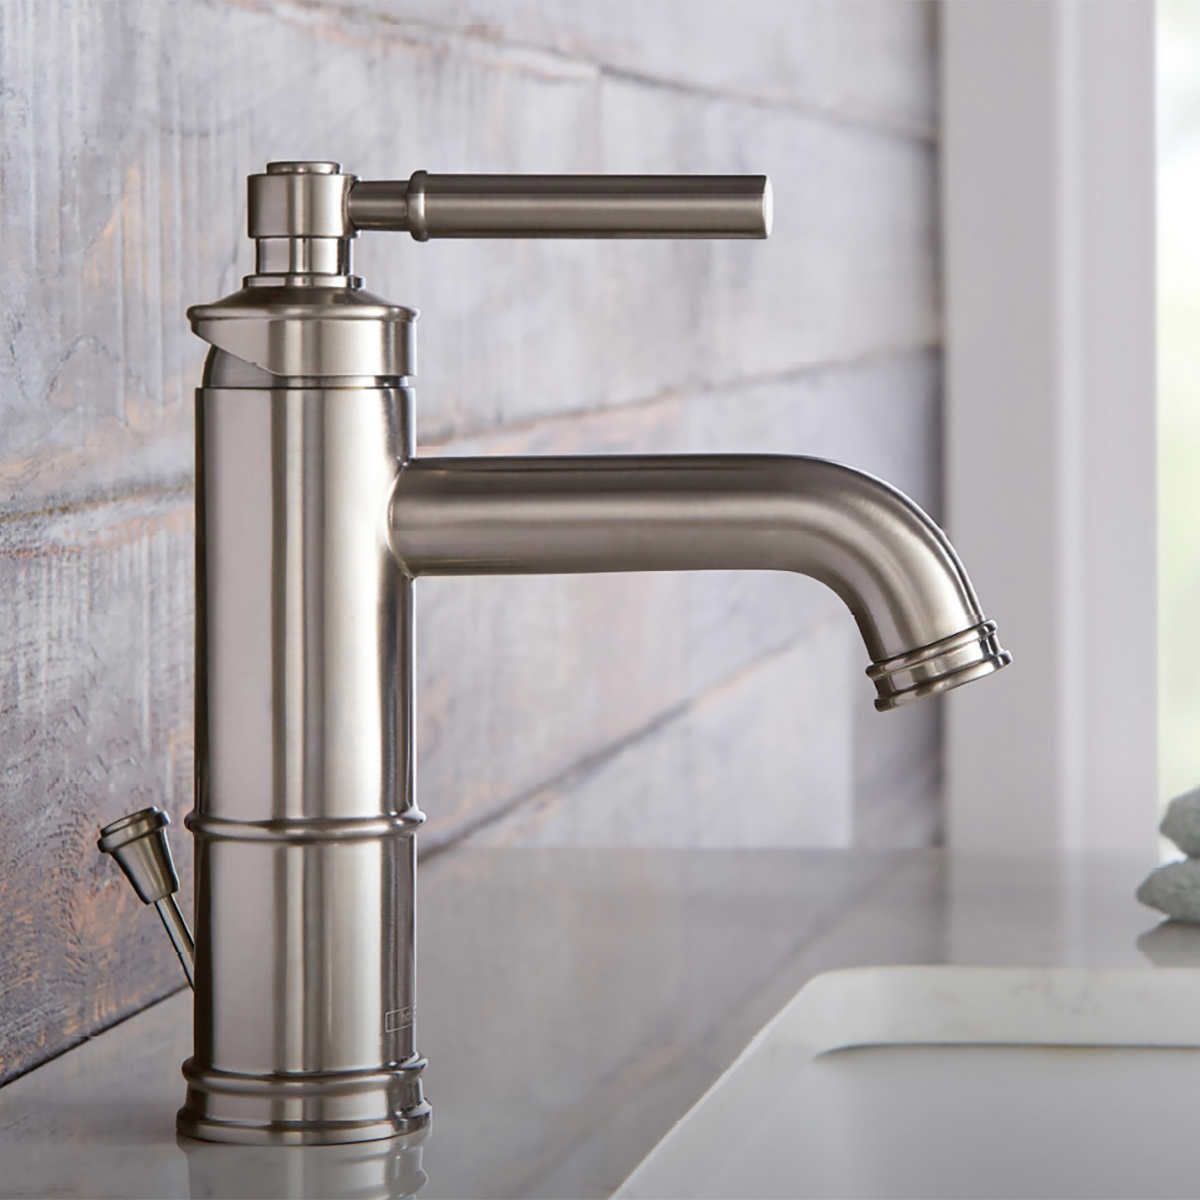 Hansgrohe Status Lavatory Faucet Bathroom Faucets Lavatory Faucet Hansgrohe